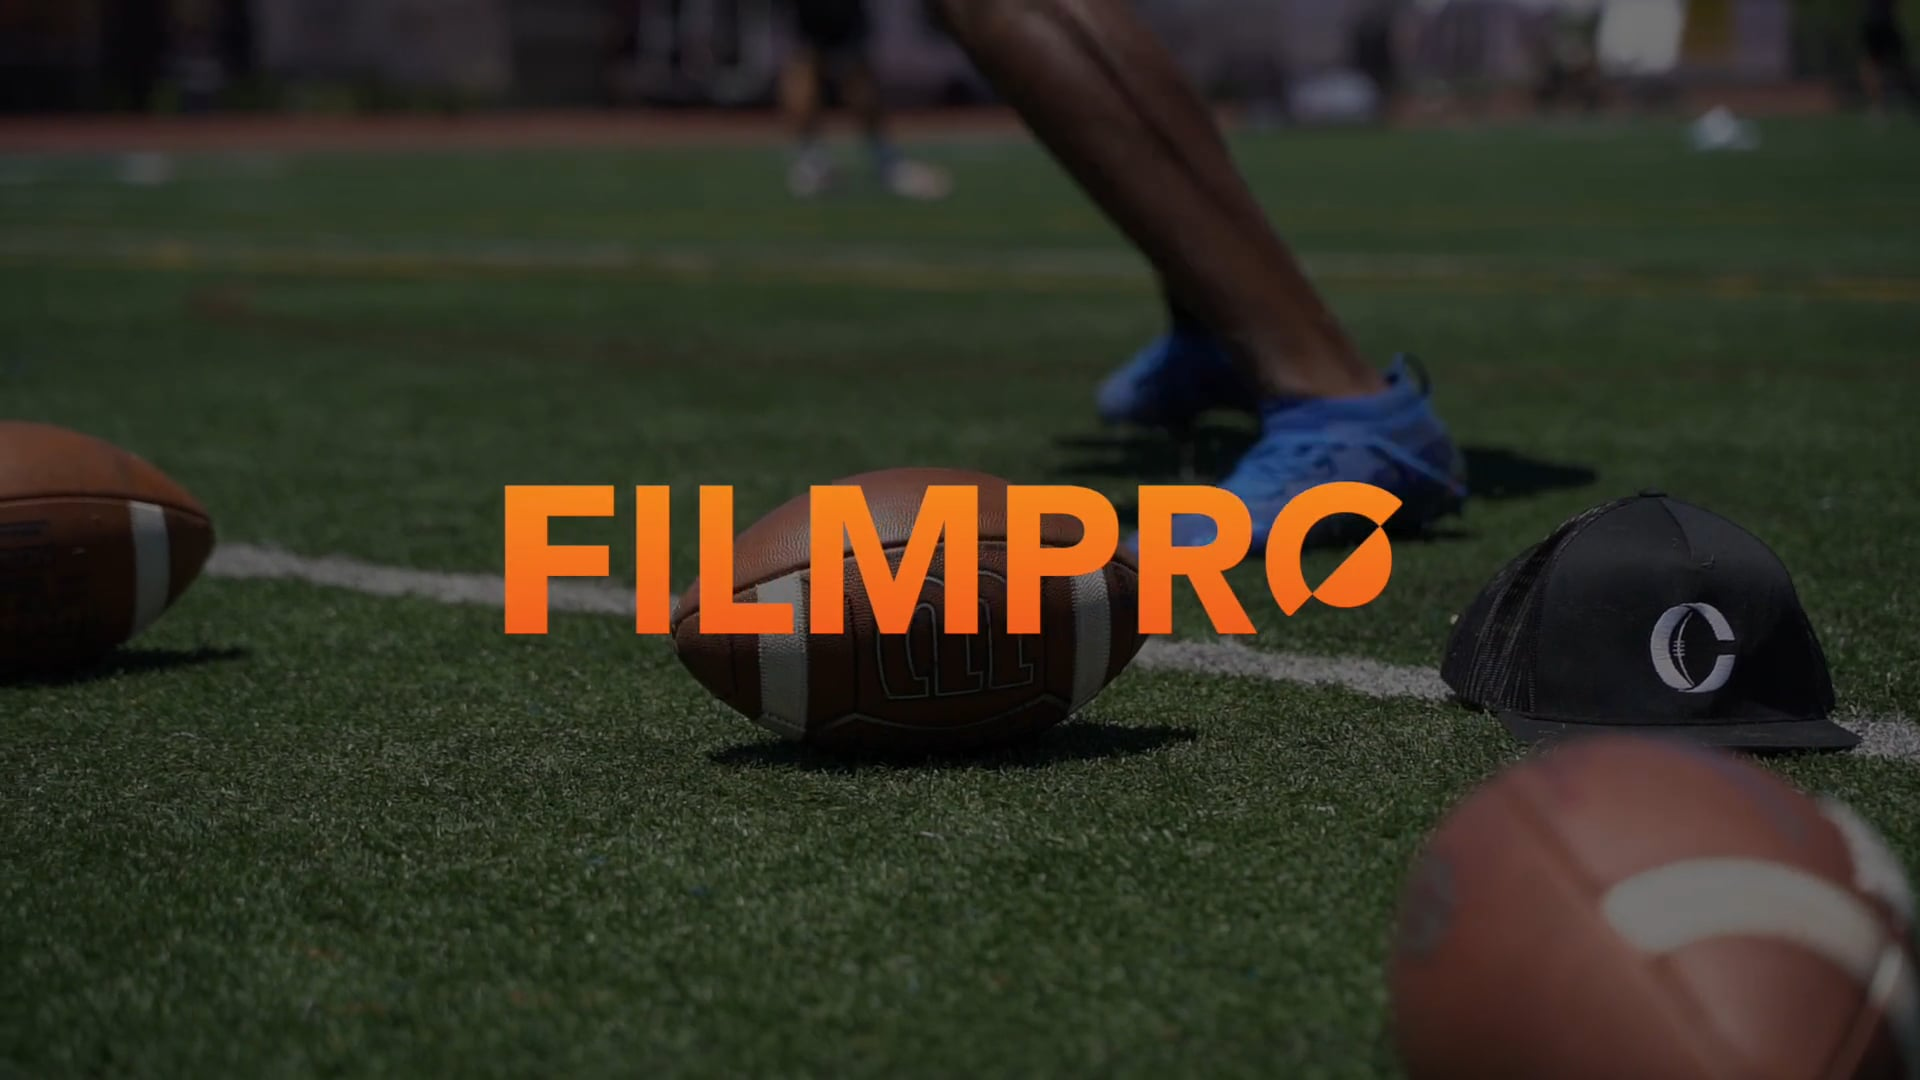 NFL FILMS - USA Football Camp